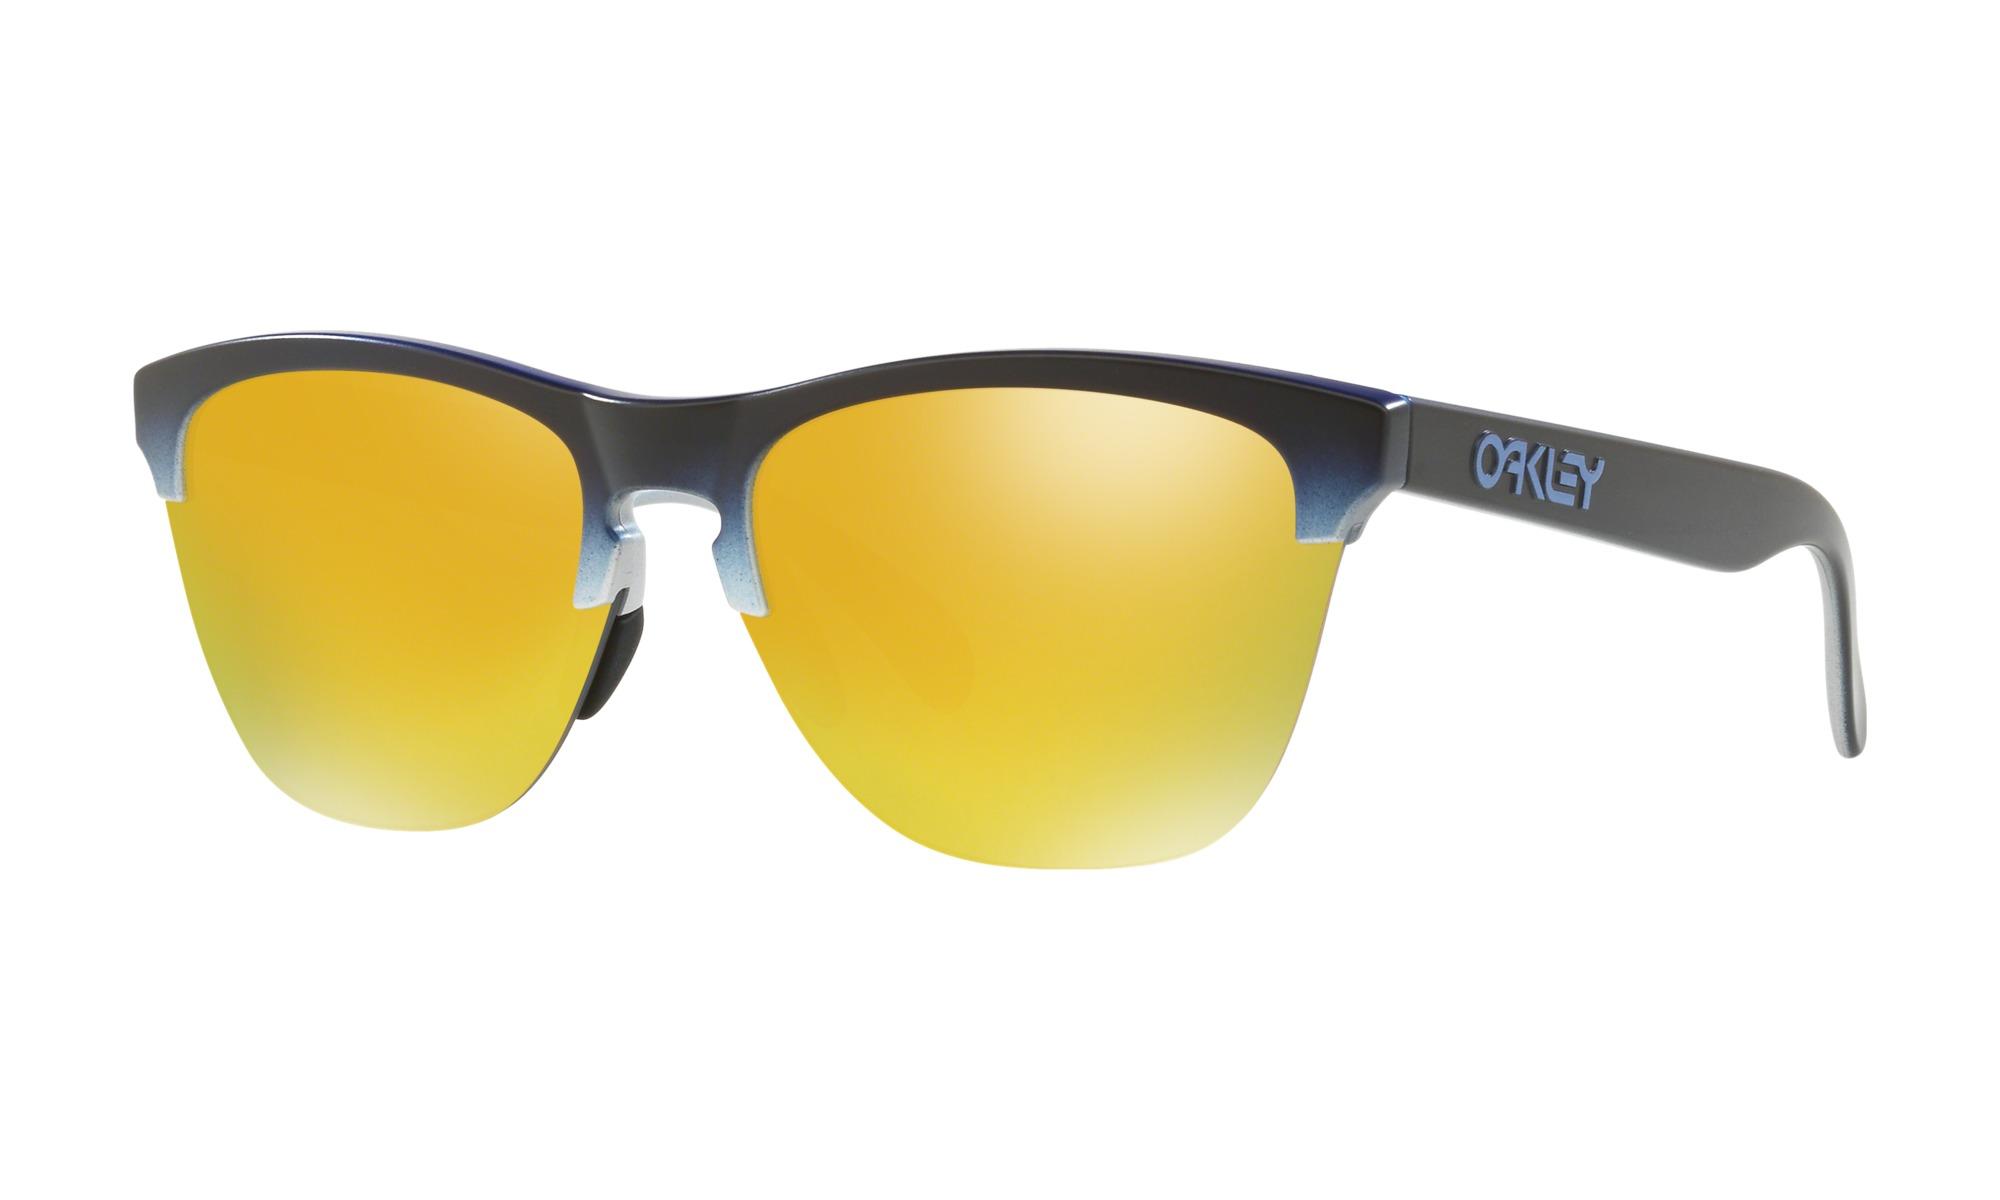 77deb514fa Oakley Sunglasses Frogskins Lite 24K Lite Splatterfade Collection / Black  Pink / 24K Iridium / Ref. OO9374-1763 | Alltricks.com